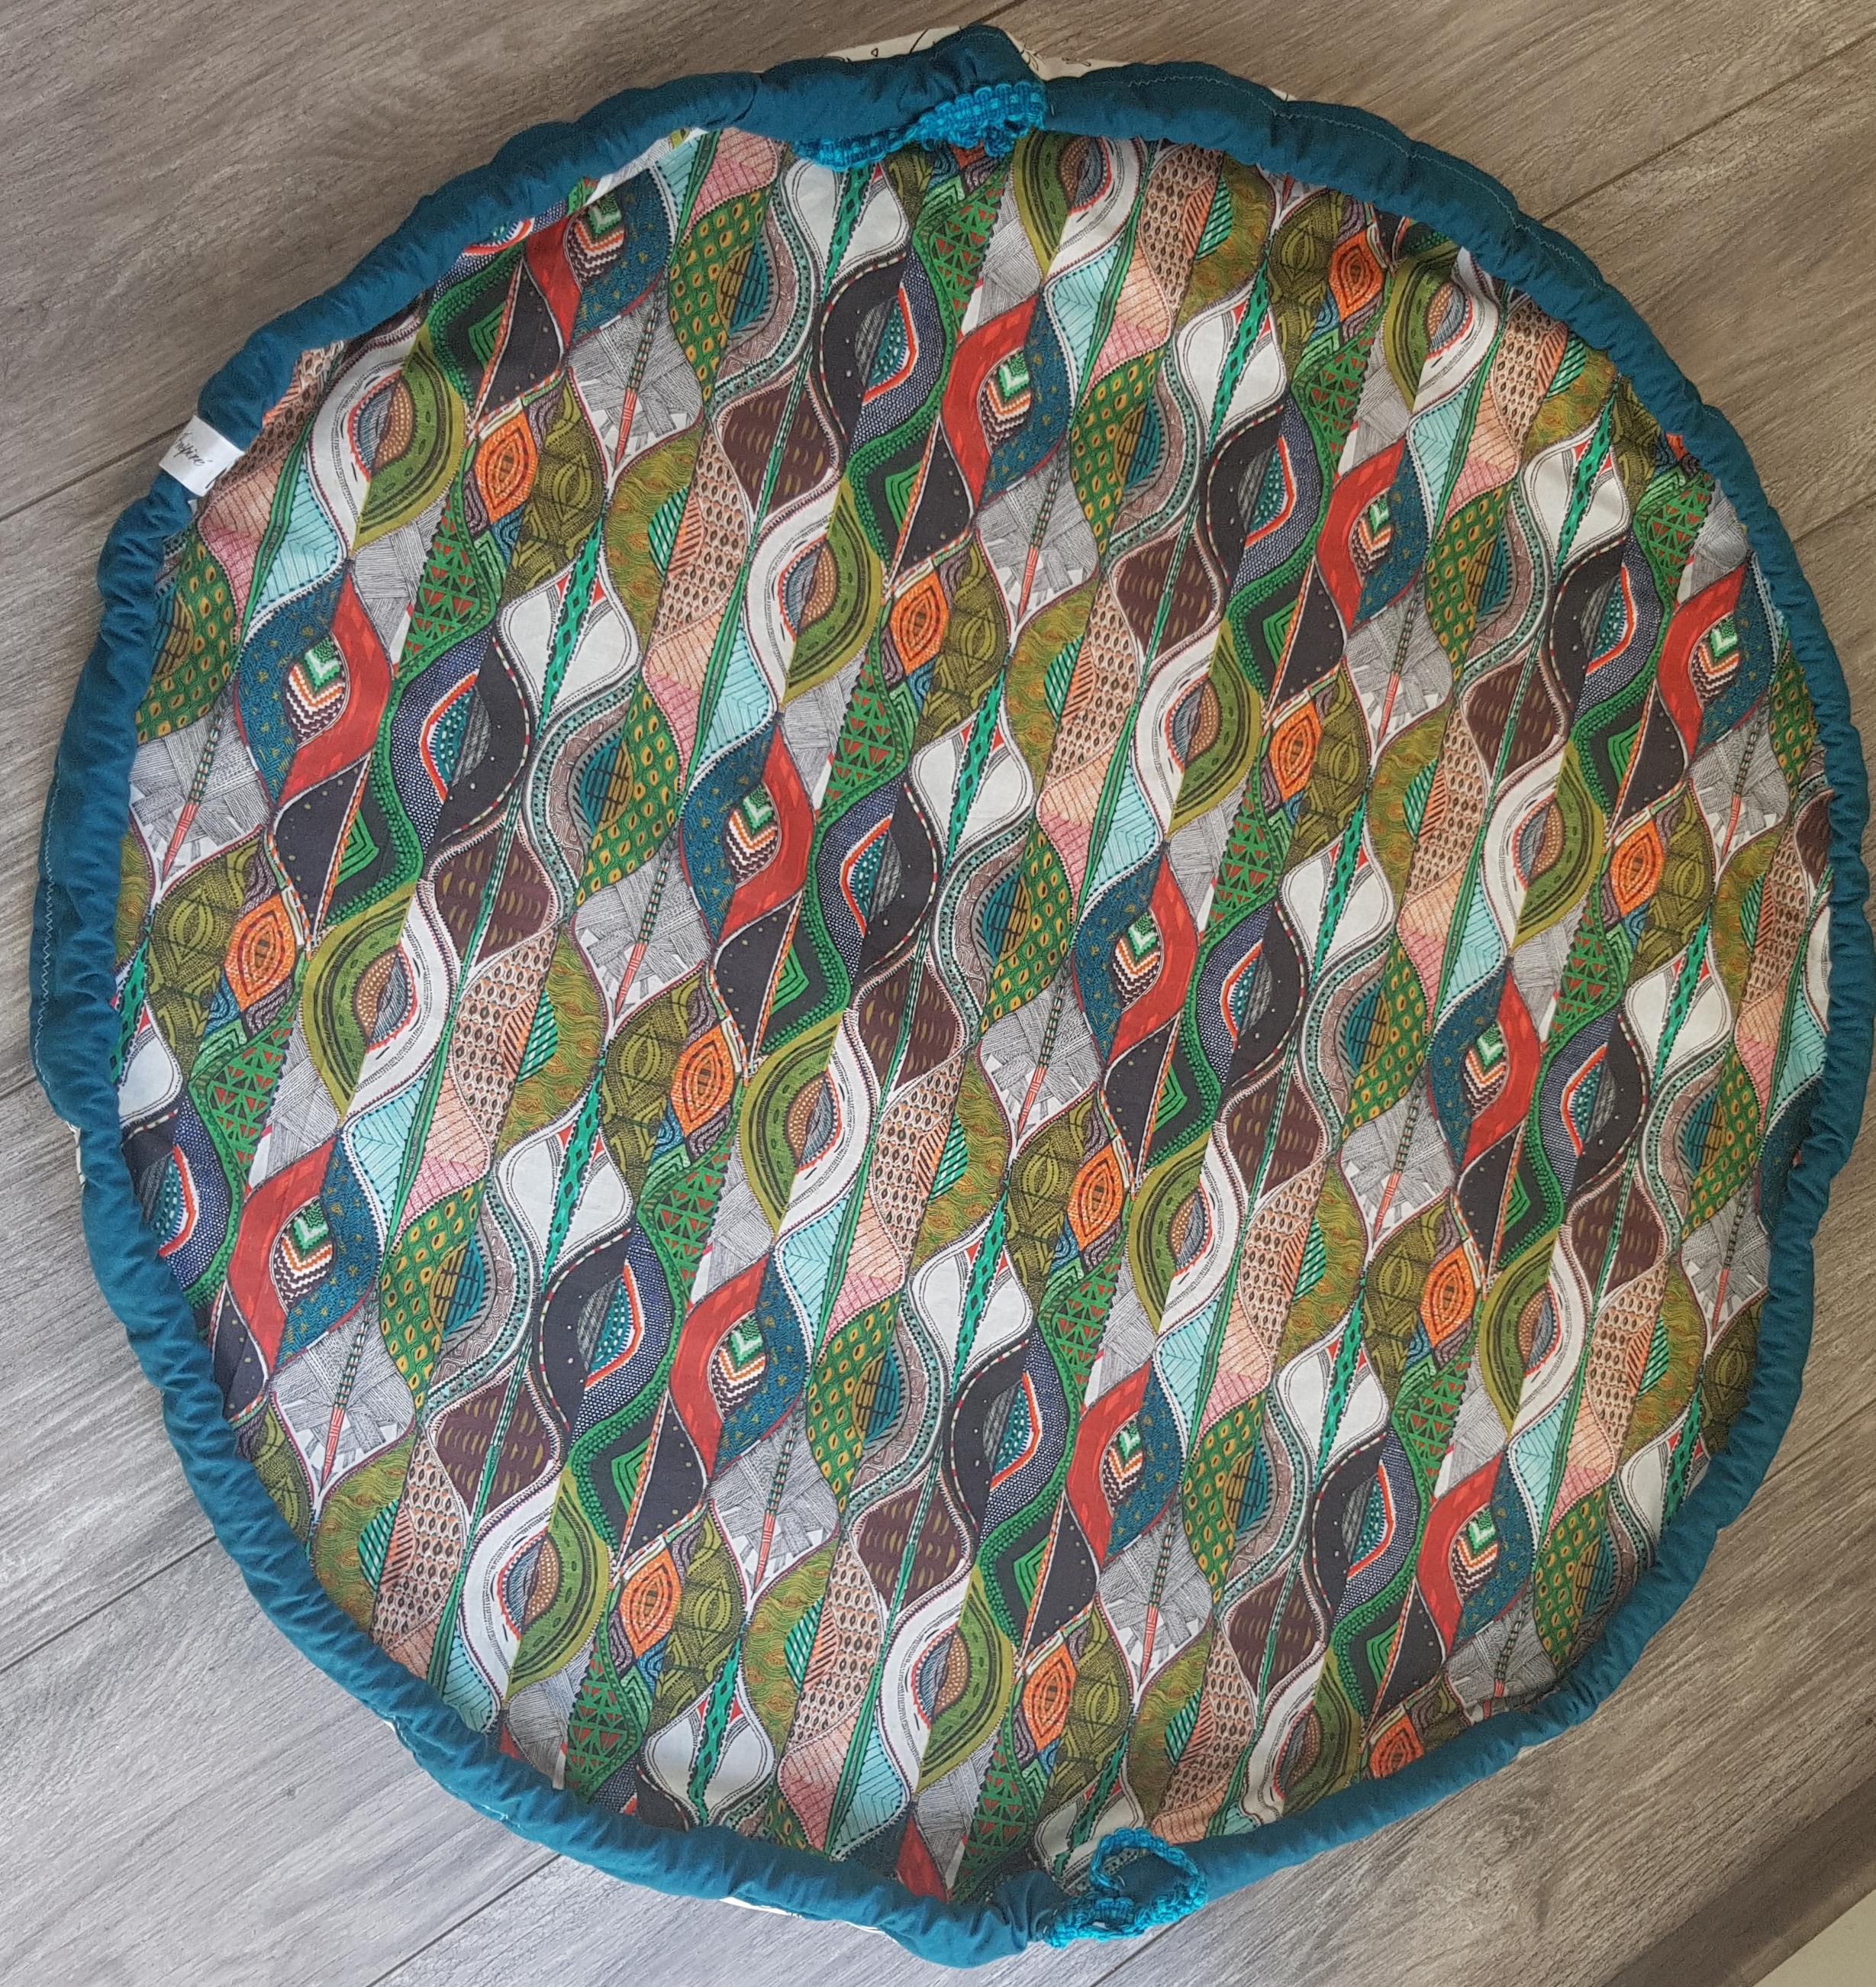 Tuto Tapis D Éveil Nomade tapis de jeu bebe transformable en sac | enredada